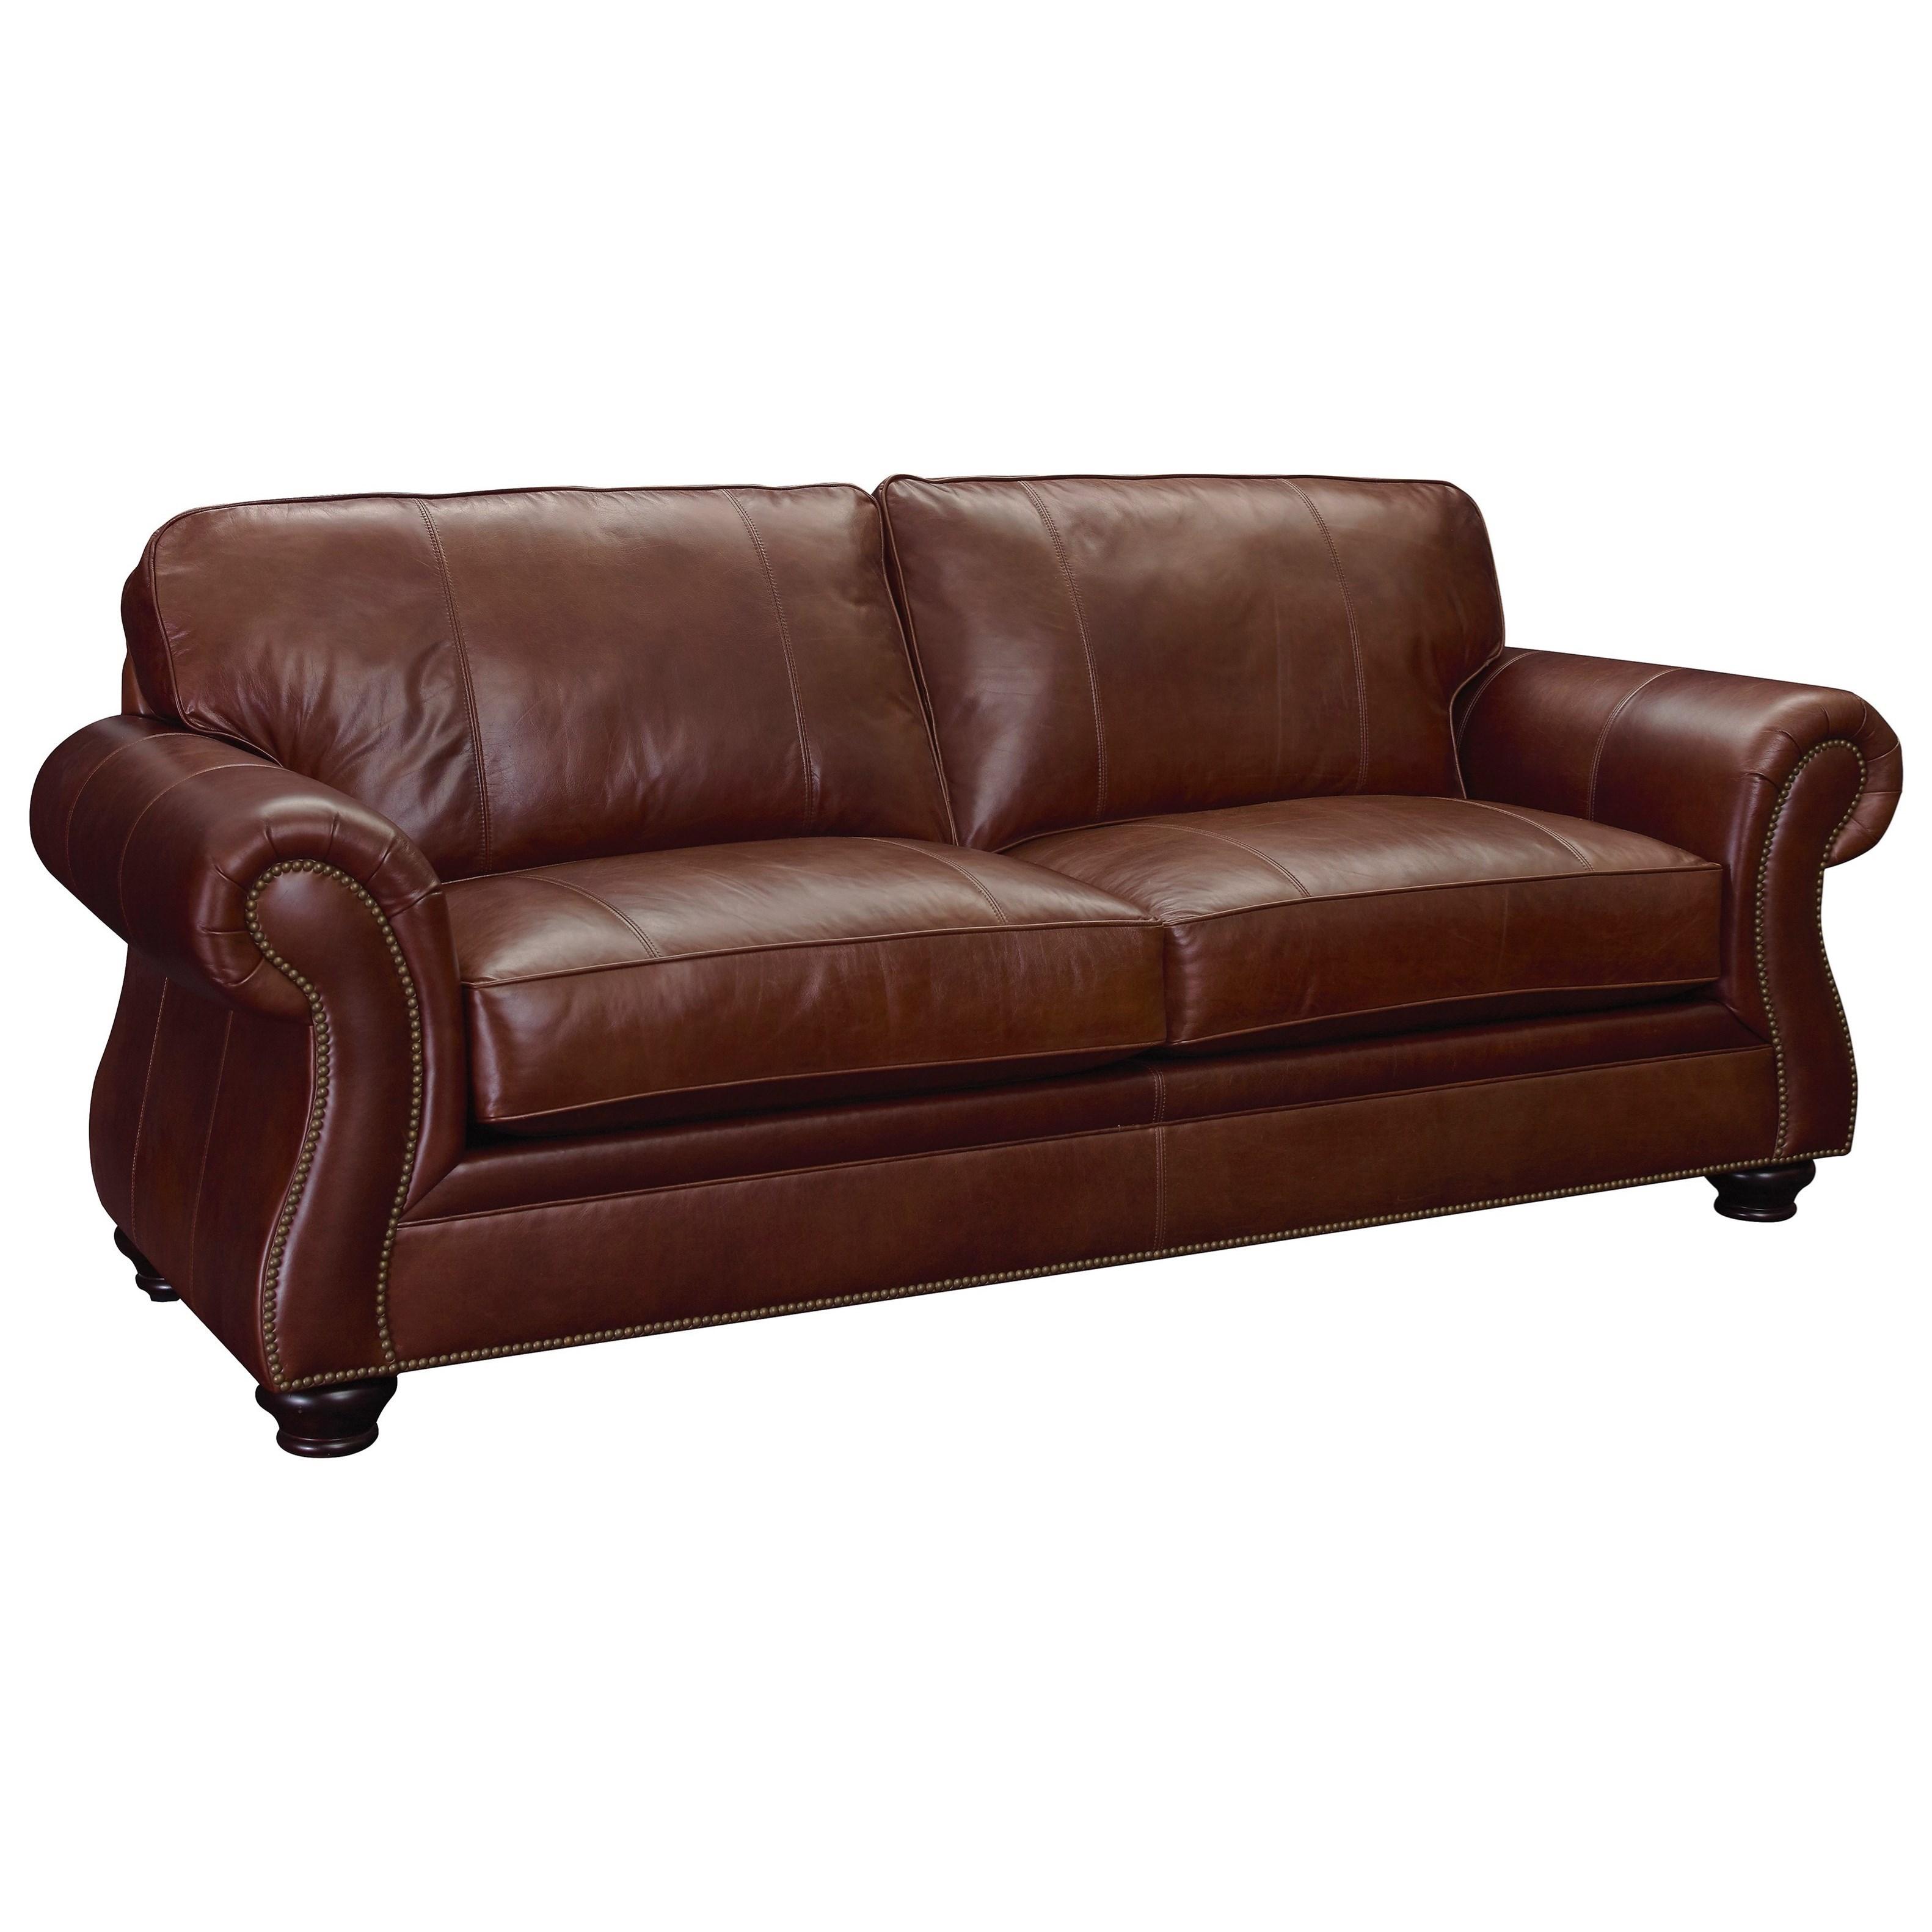 broyhill furniture laramie air dream sofa sleeper with nail head trim knight furniture. Black Bedroom Furniture Sets. Home Design Ideas